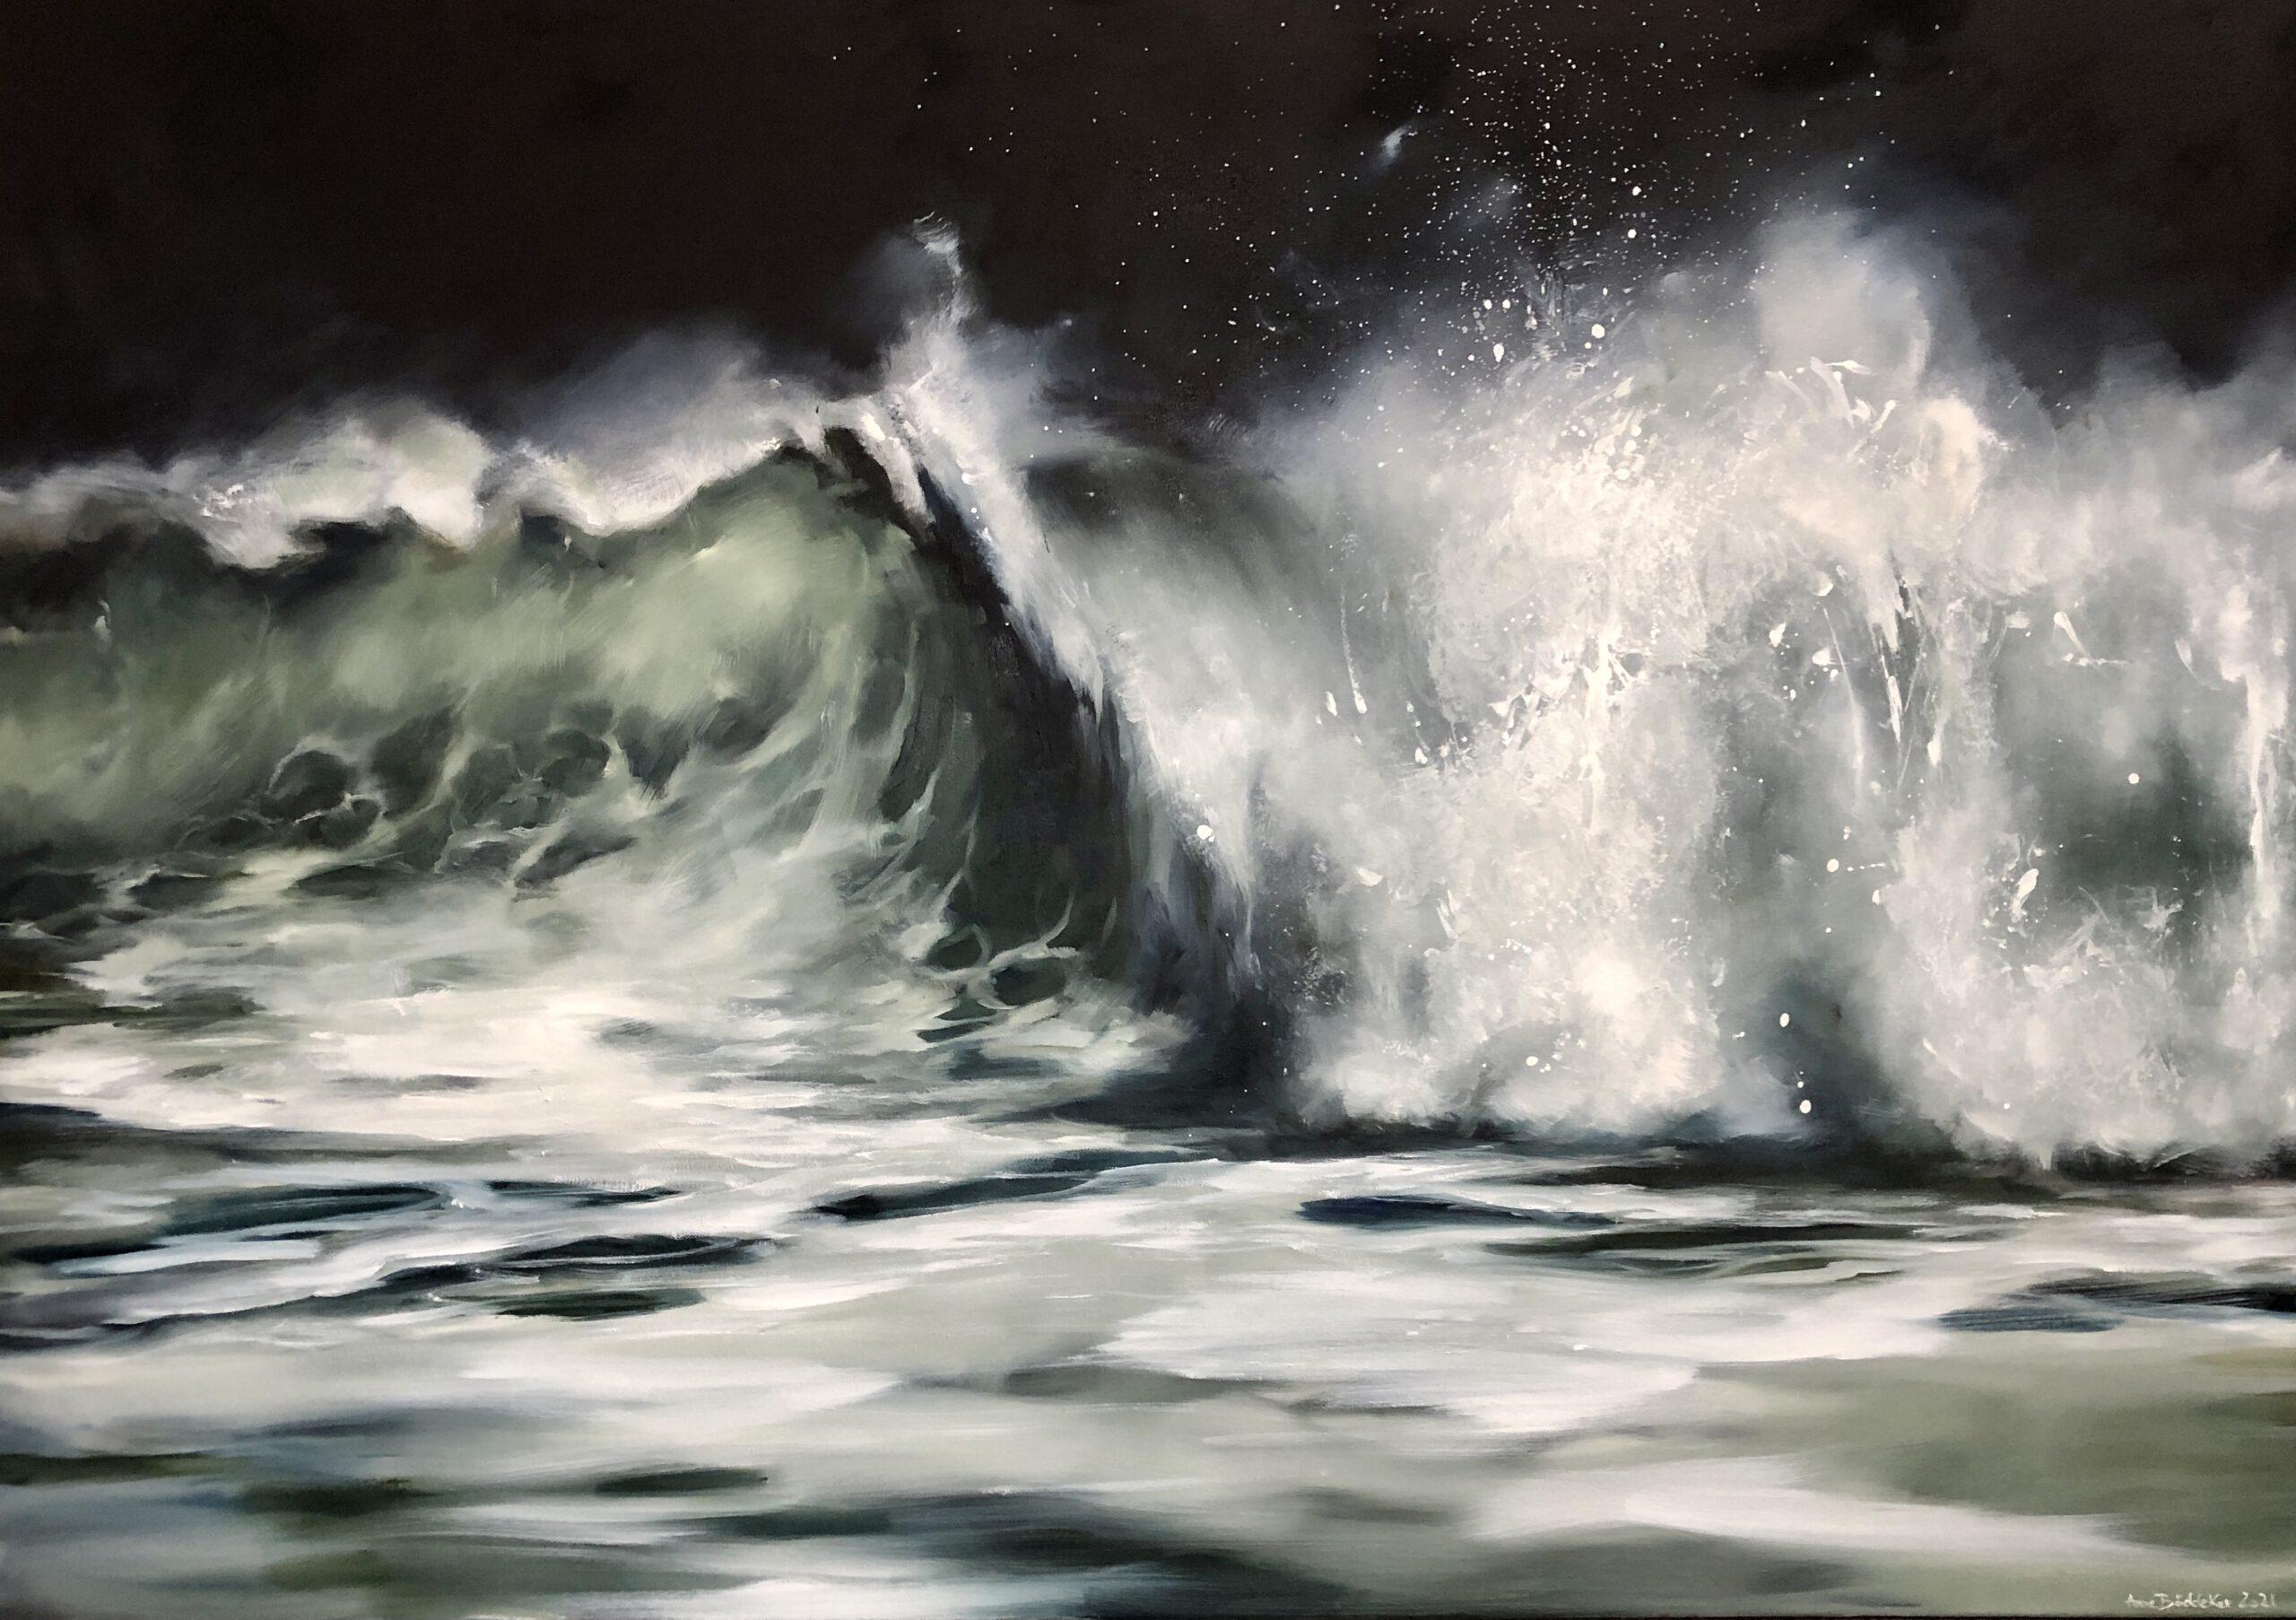 Black wave, 120x170cm, Öl auf Leinwand